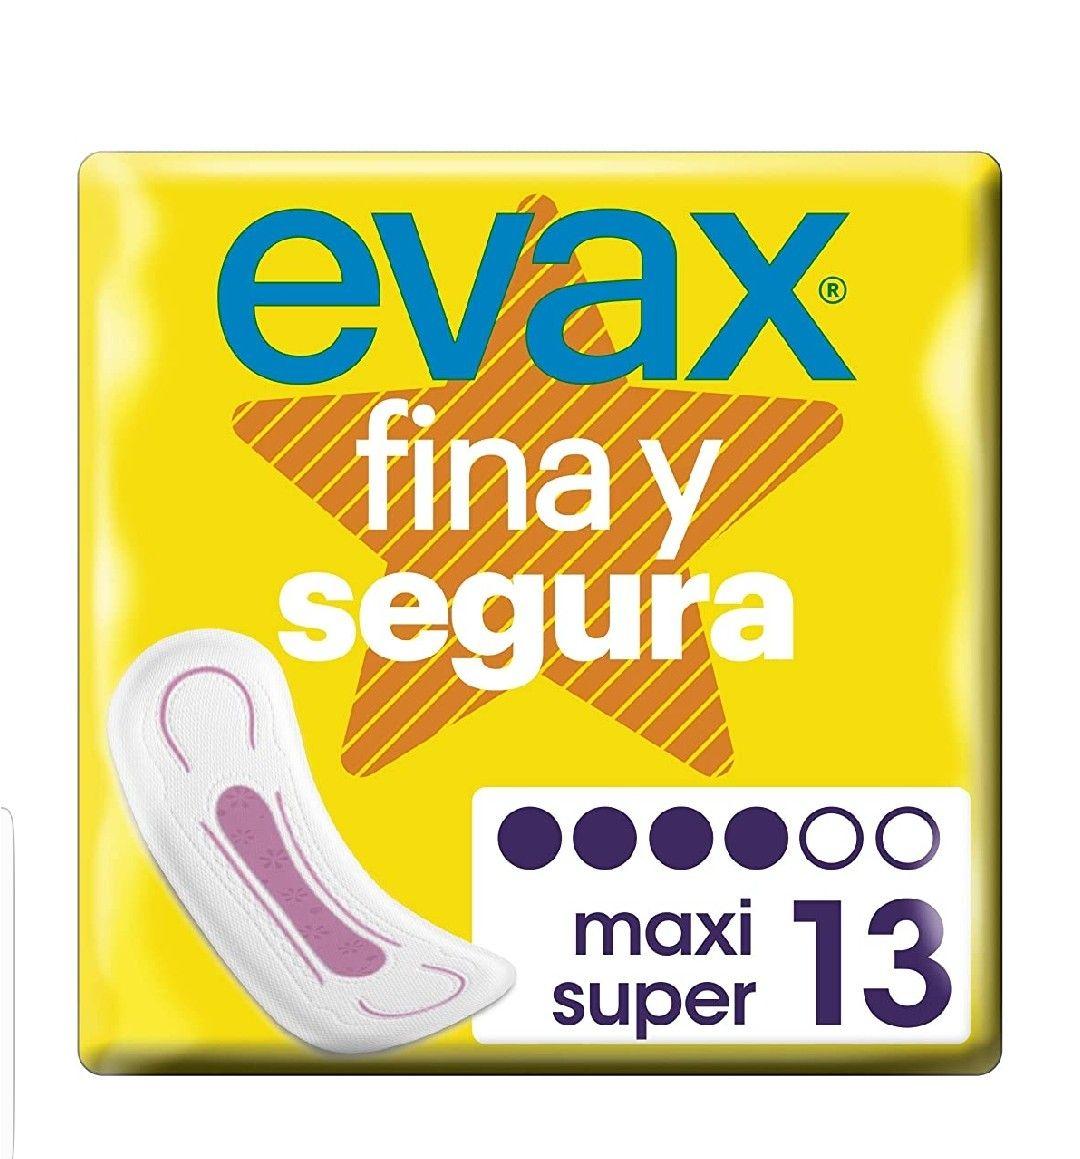 Evax Fina y Segura. Super/Maxi.